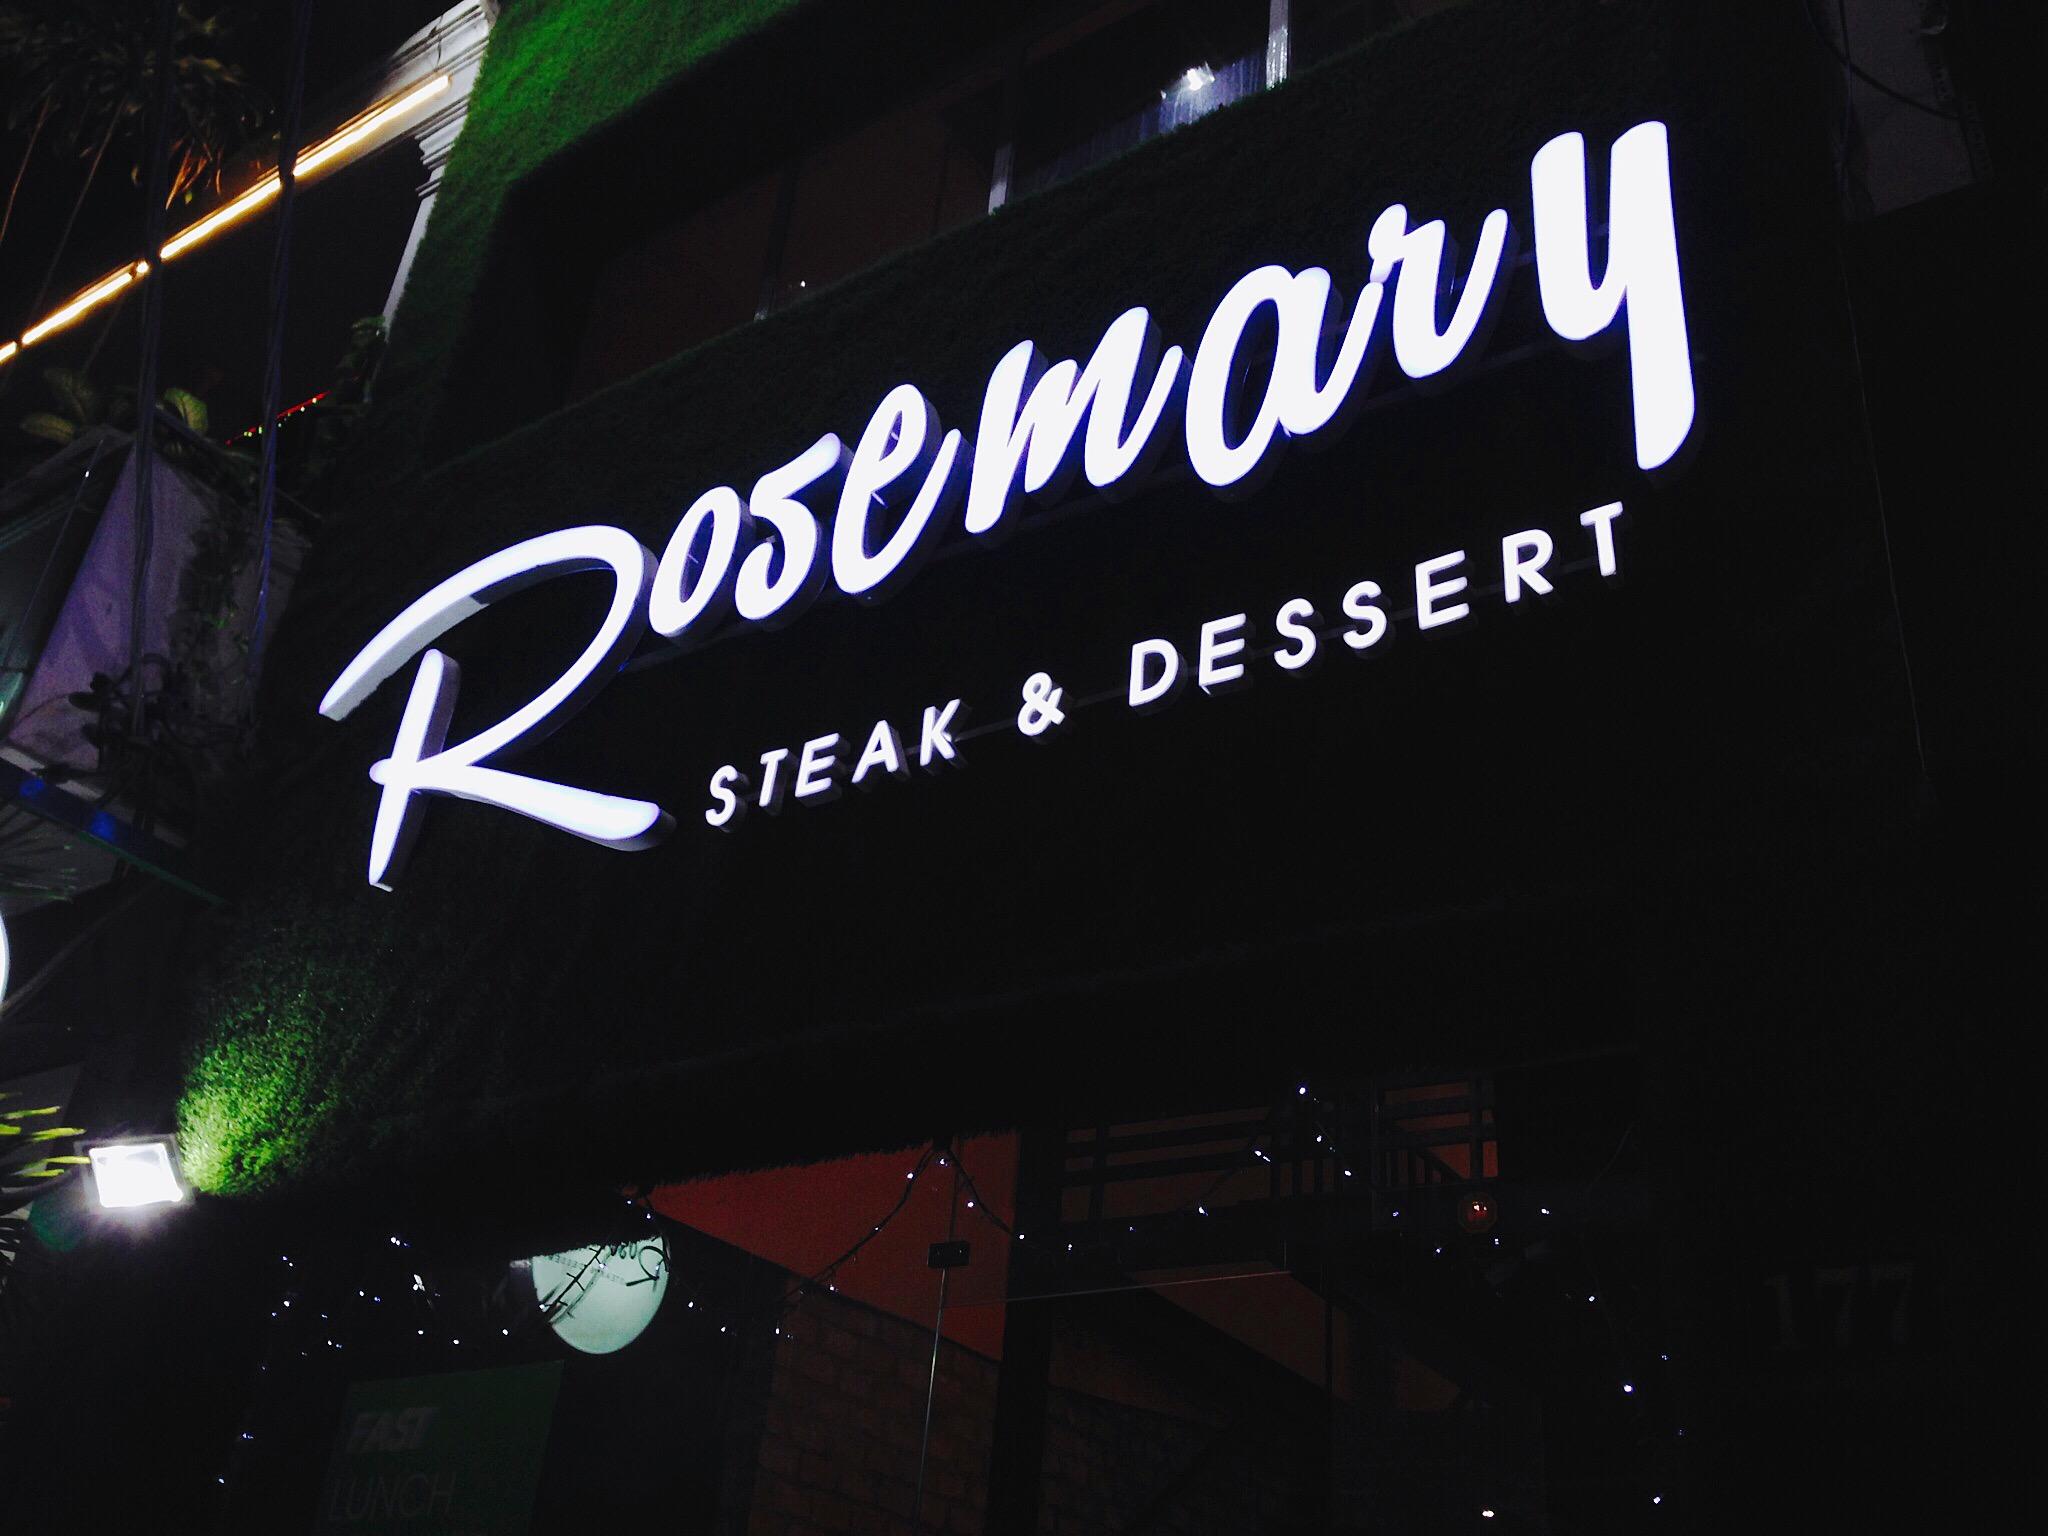 Rosemary Beefsteak